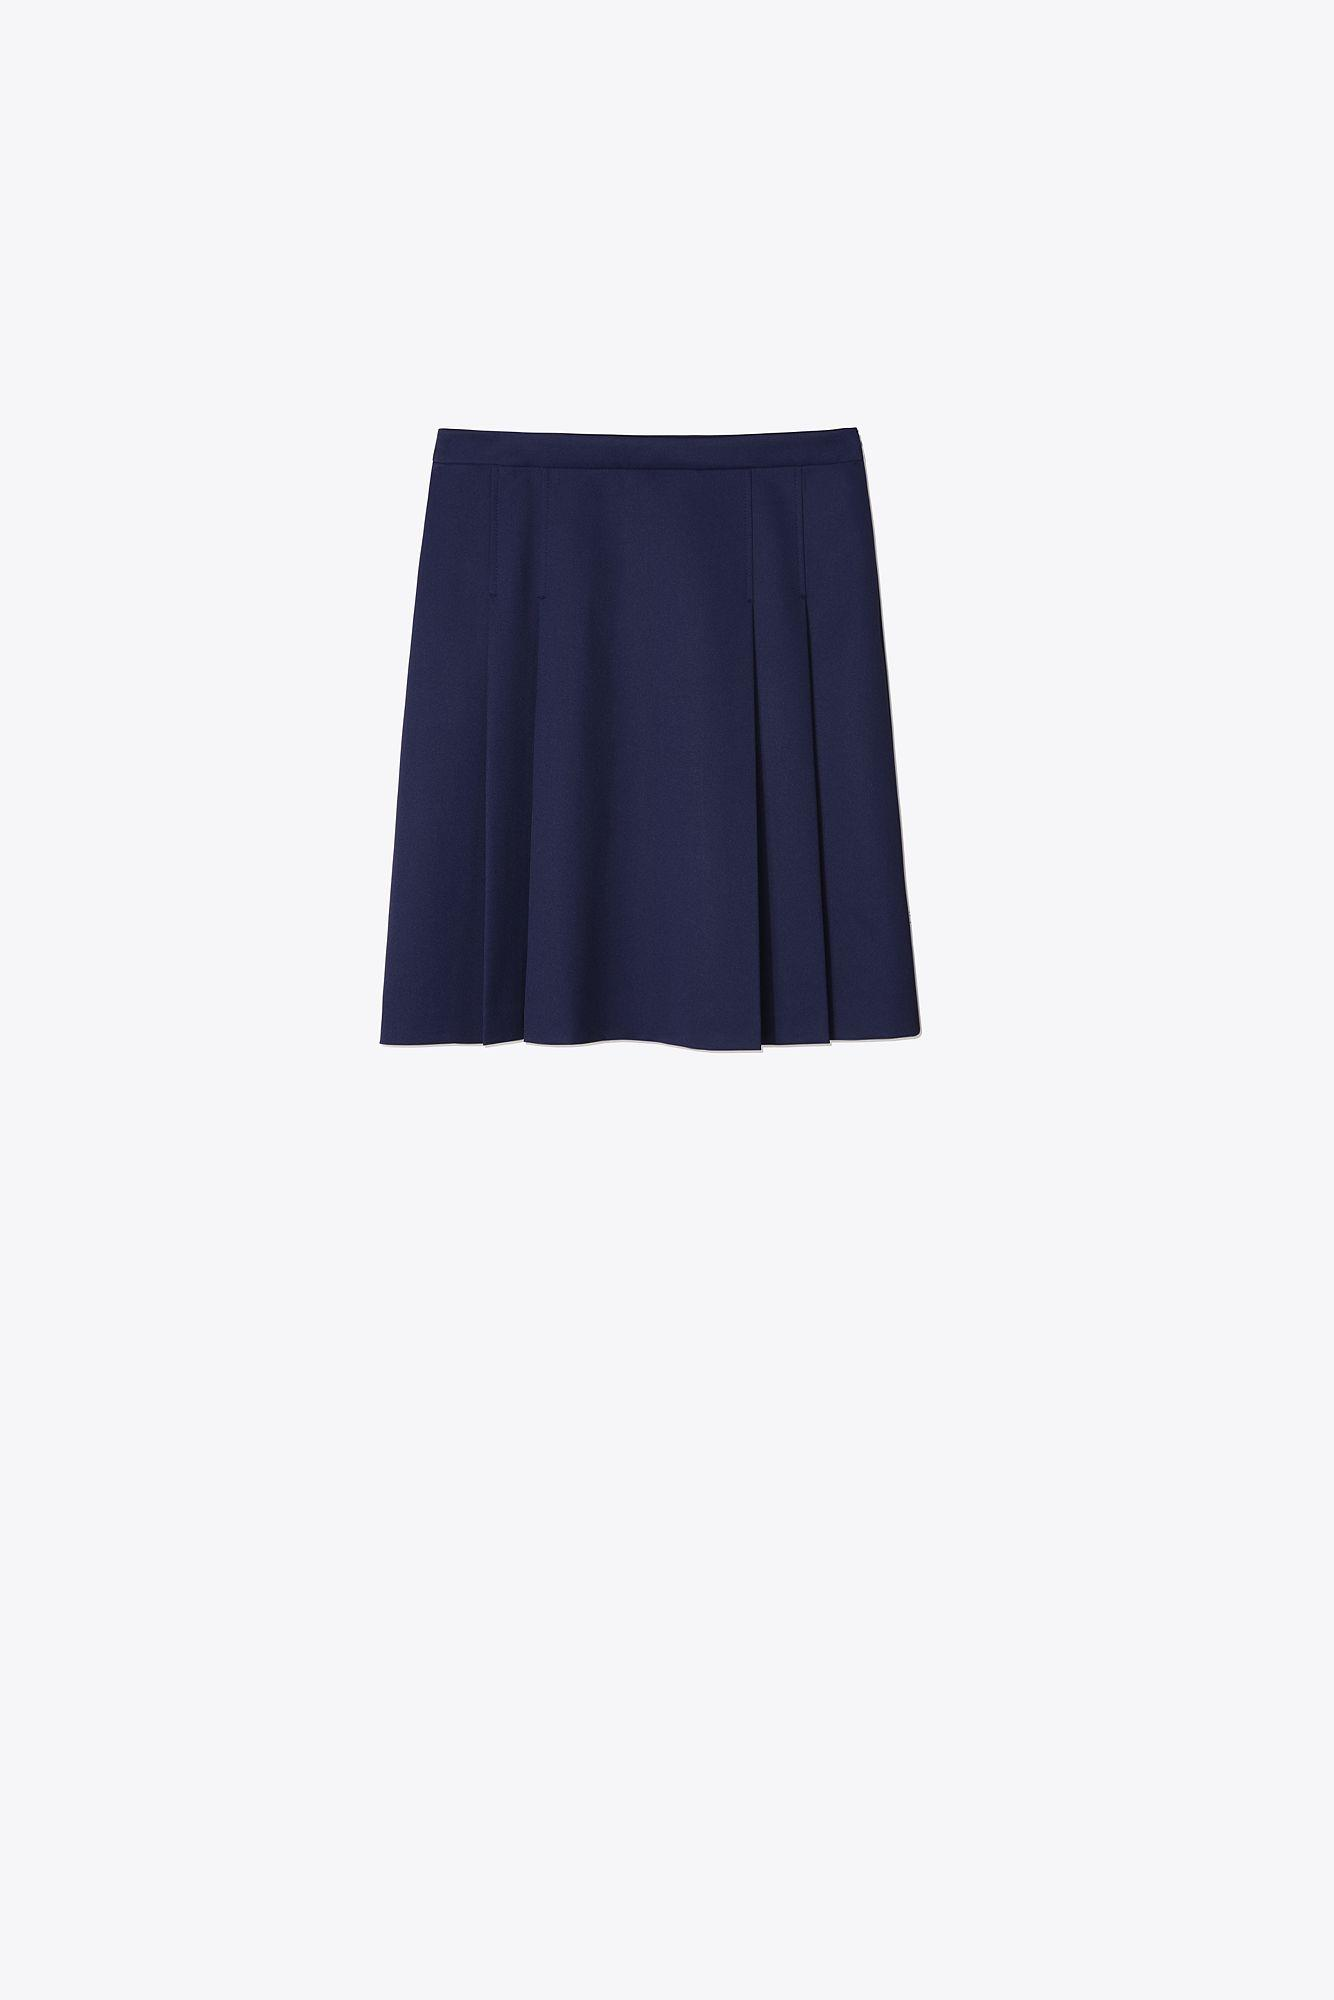 fe497b3e26 Tory Sport Tech Twill Golf Skirt | 405 | Skirts in Blue - Lyst